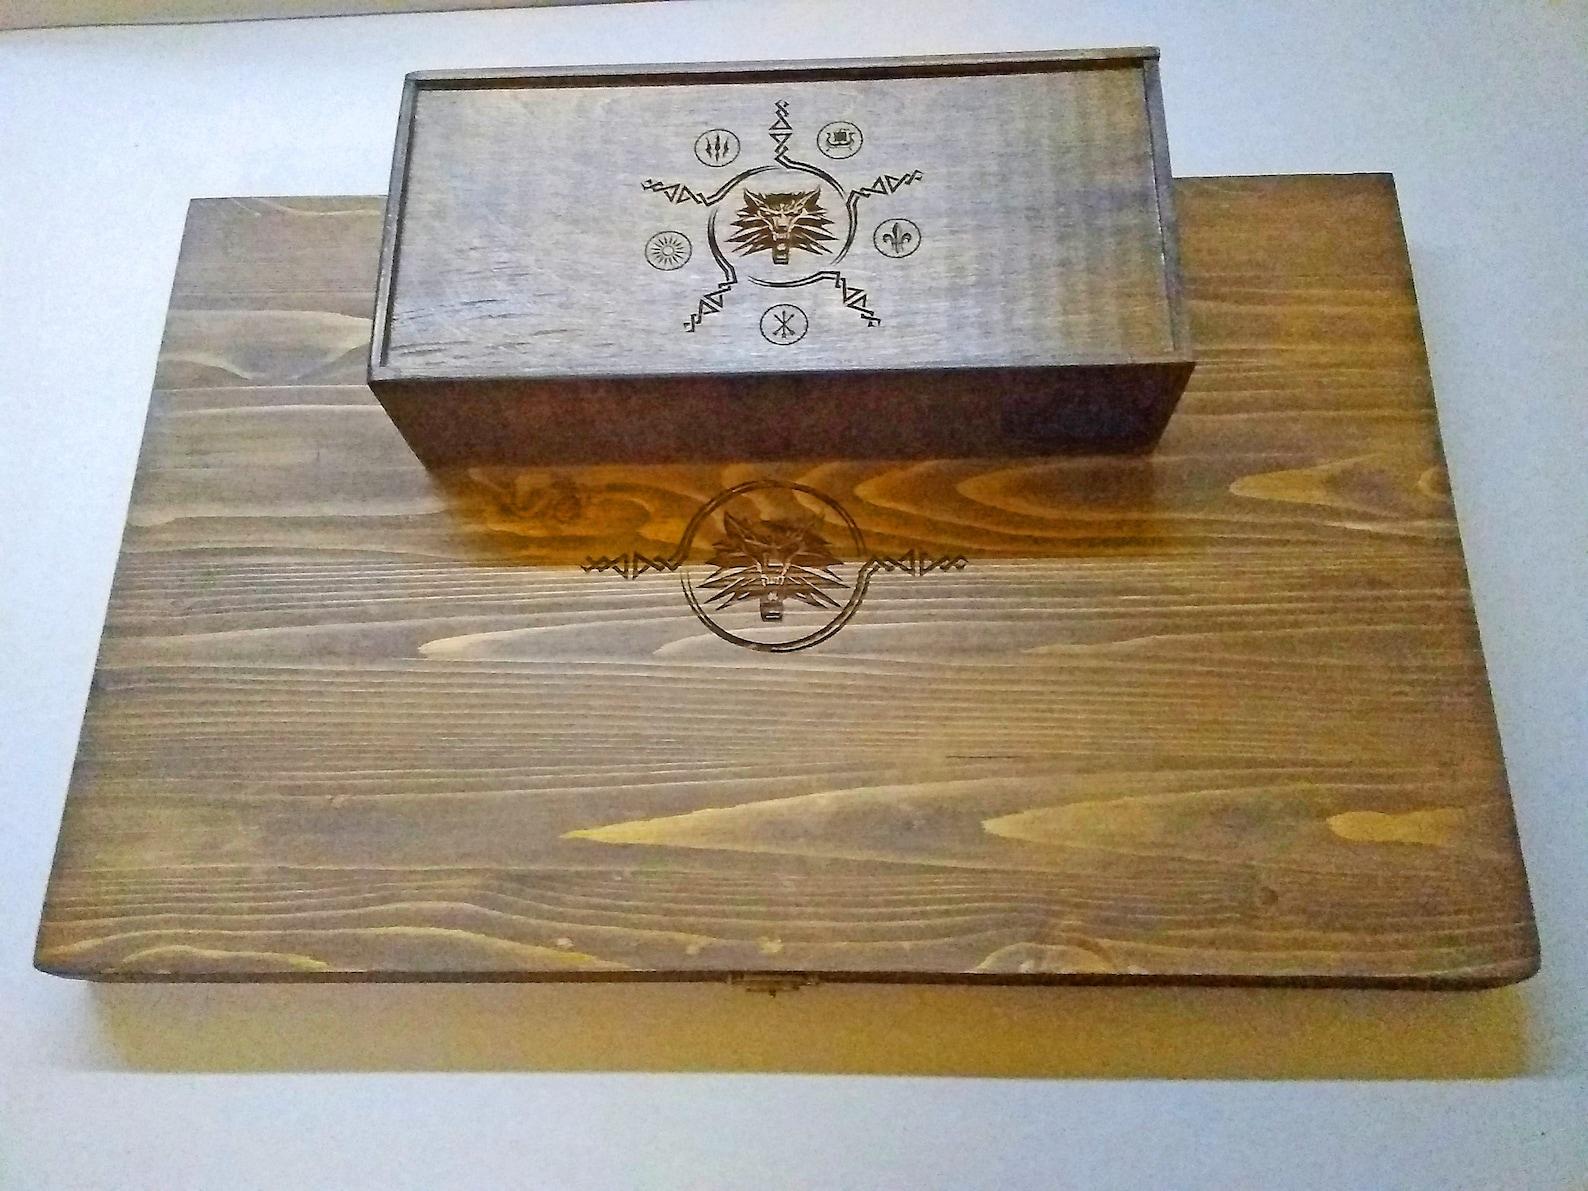 Handmade Wooden Gwent Card Deck Box & Board